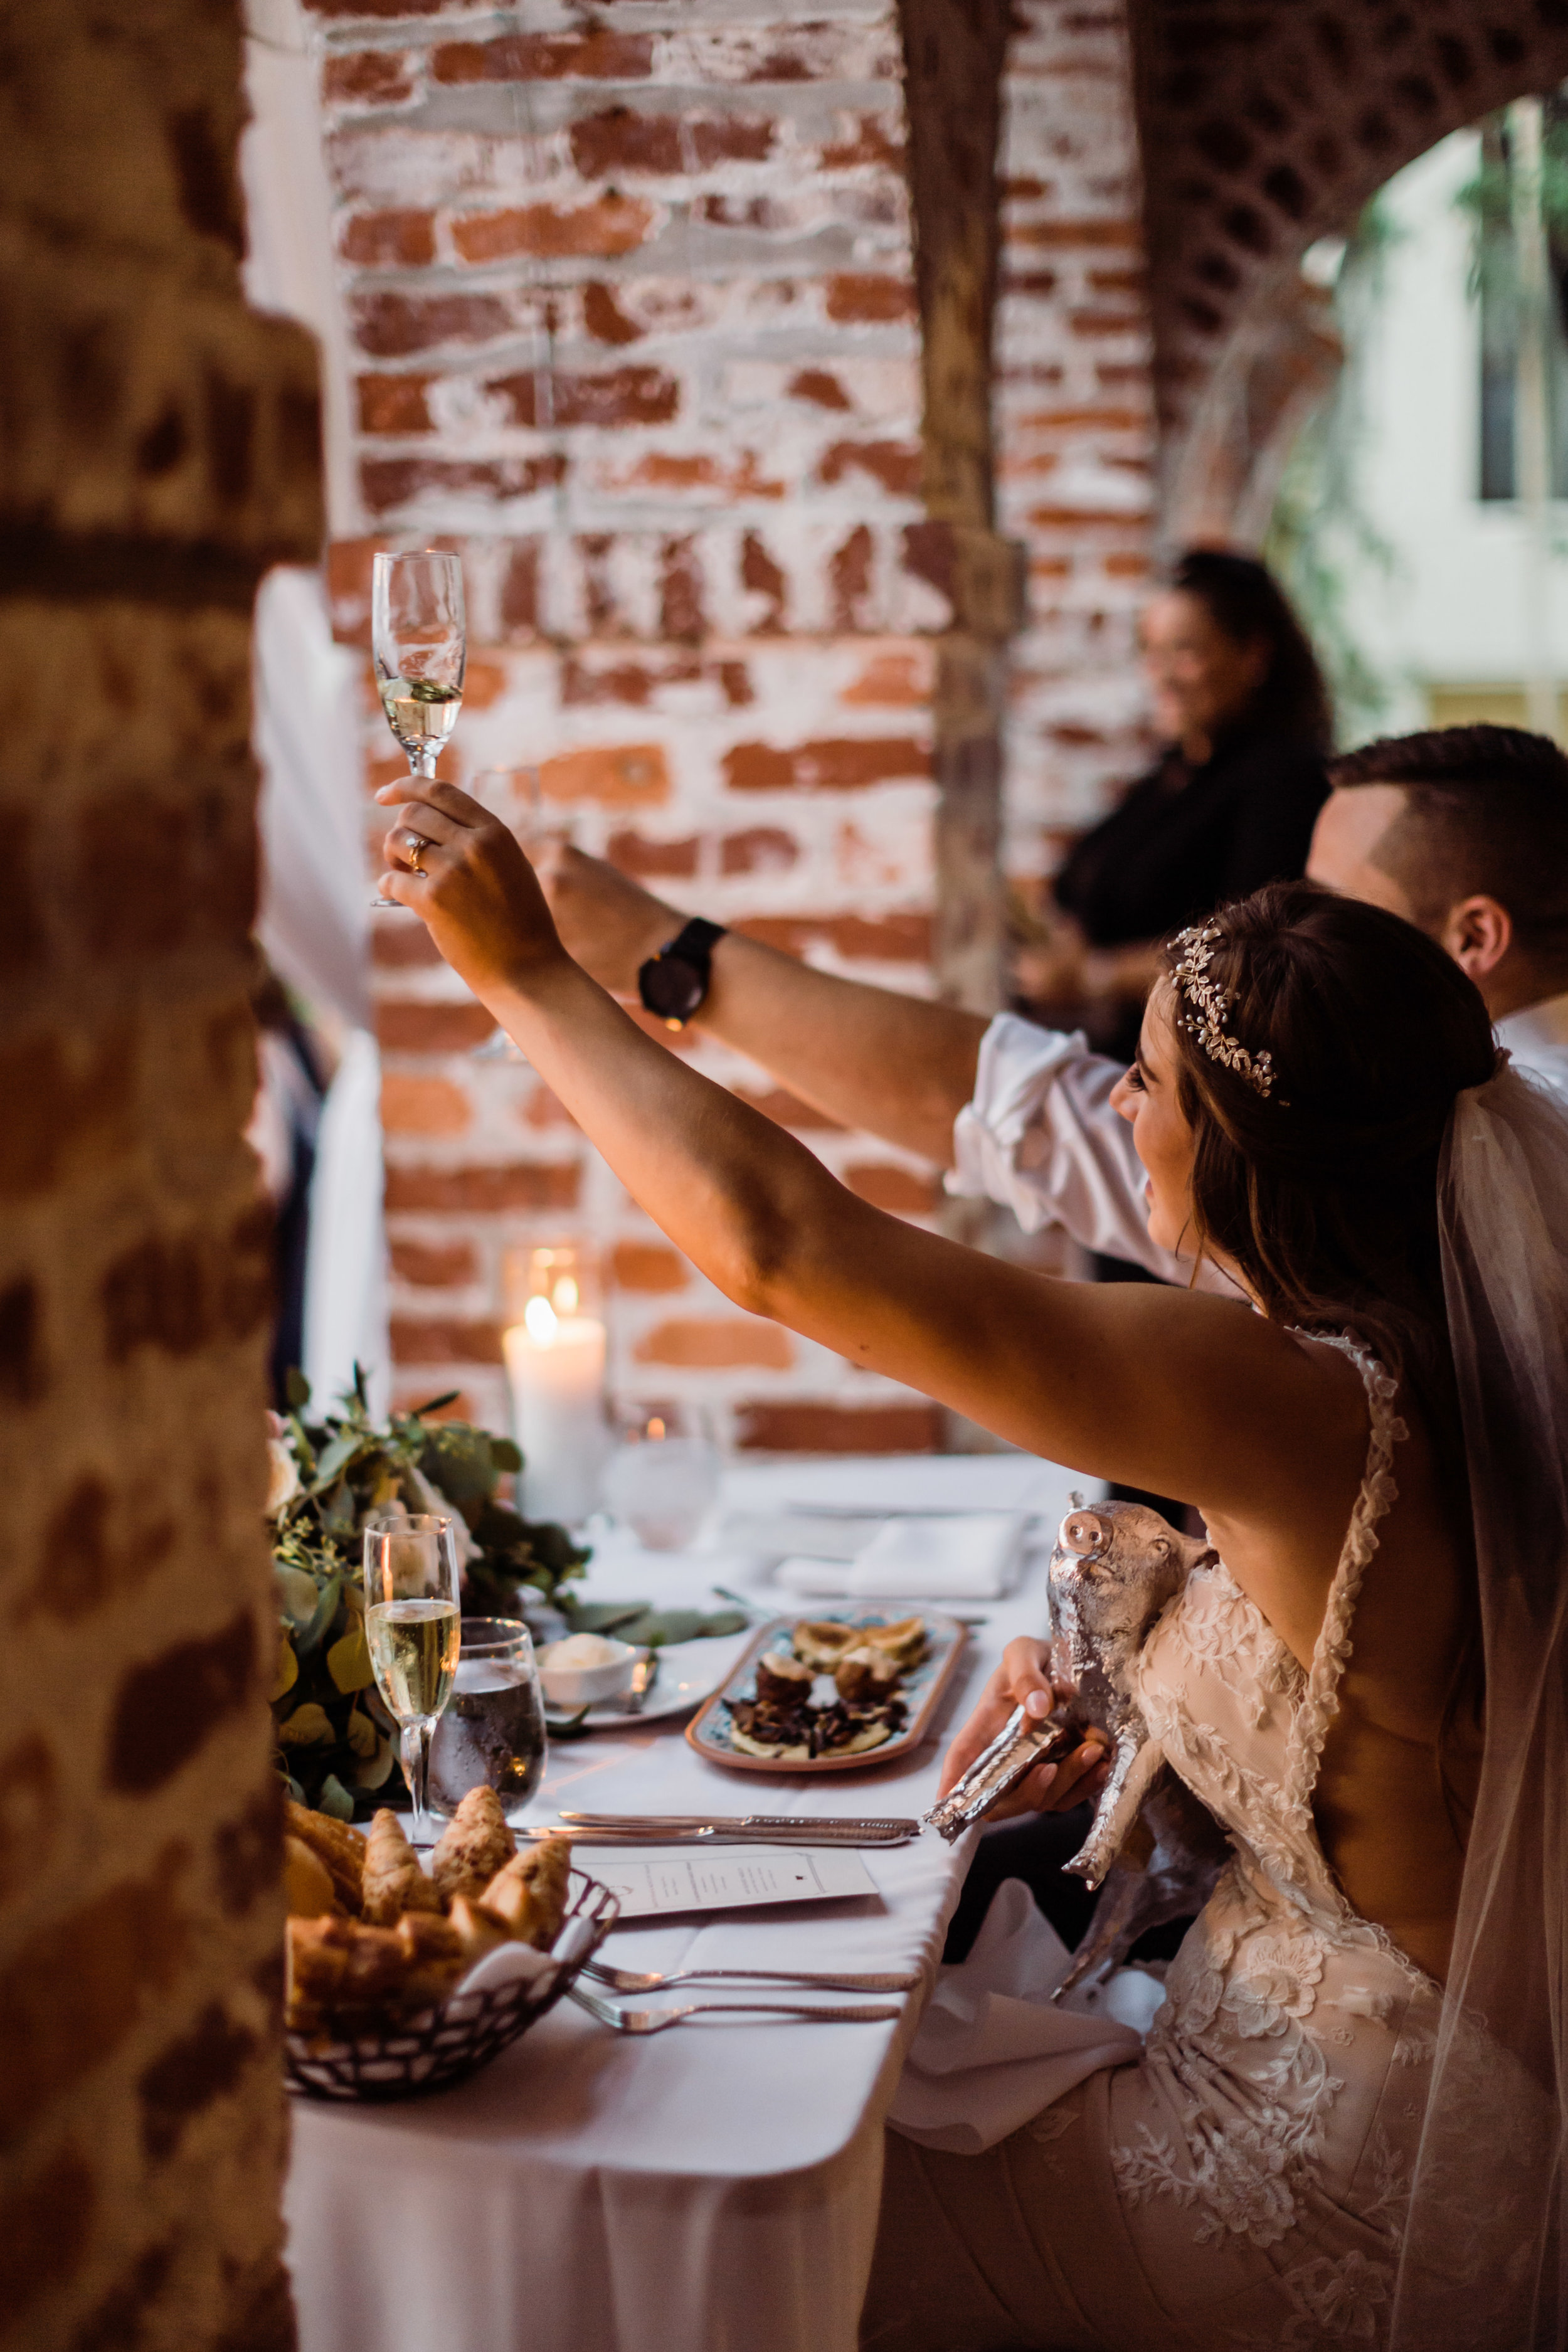 2017.10.15 Steffi and Elliott Simmonds Casa Feliz Wedding (751 of 969).jpg